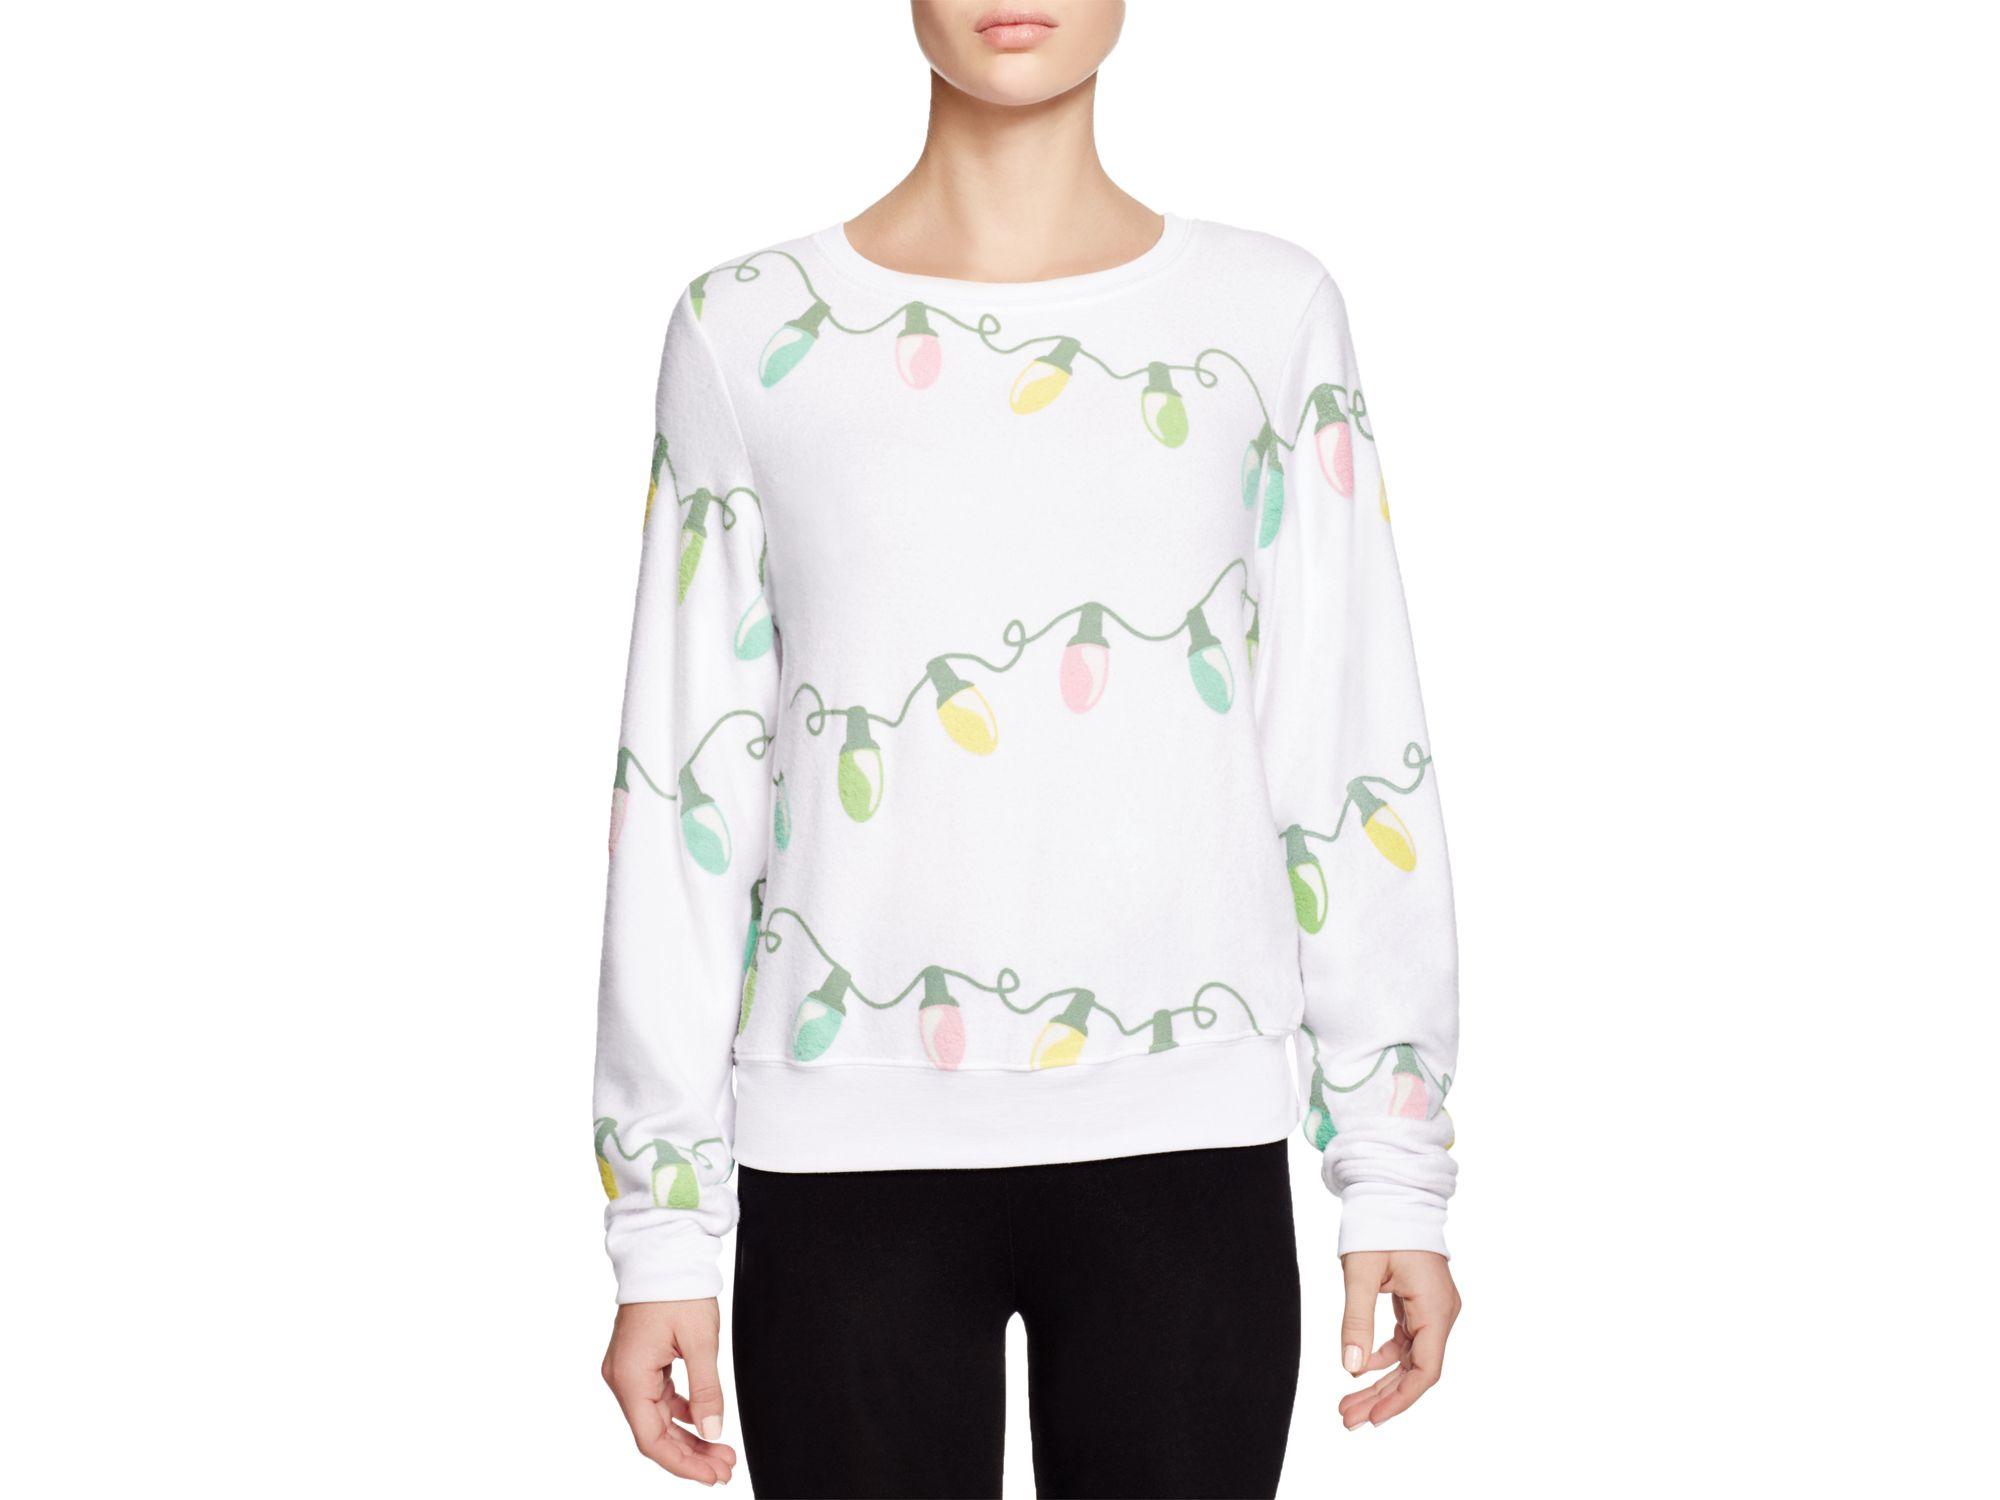 Wildfox Glowing Lights Sweatshirt in White | Lyst